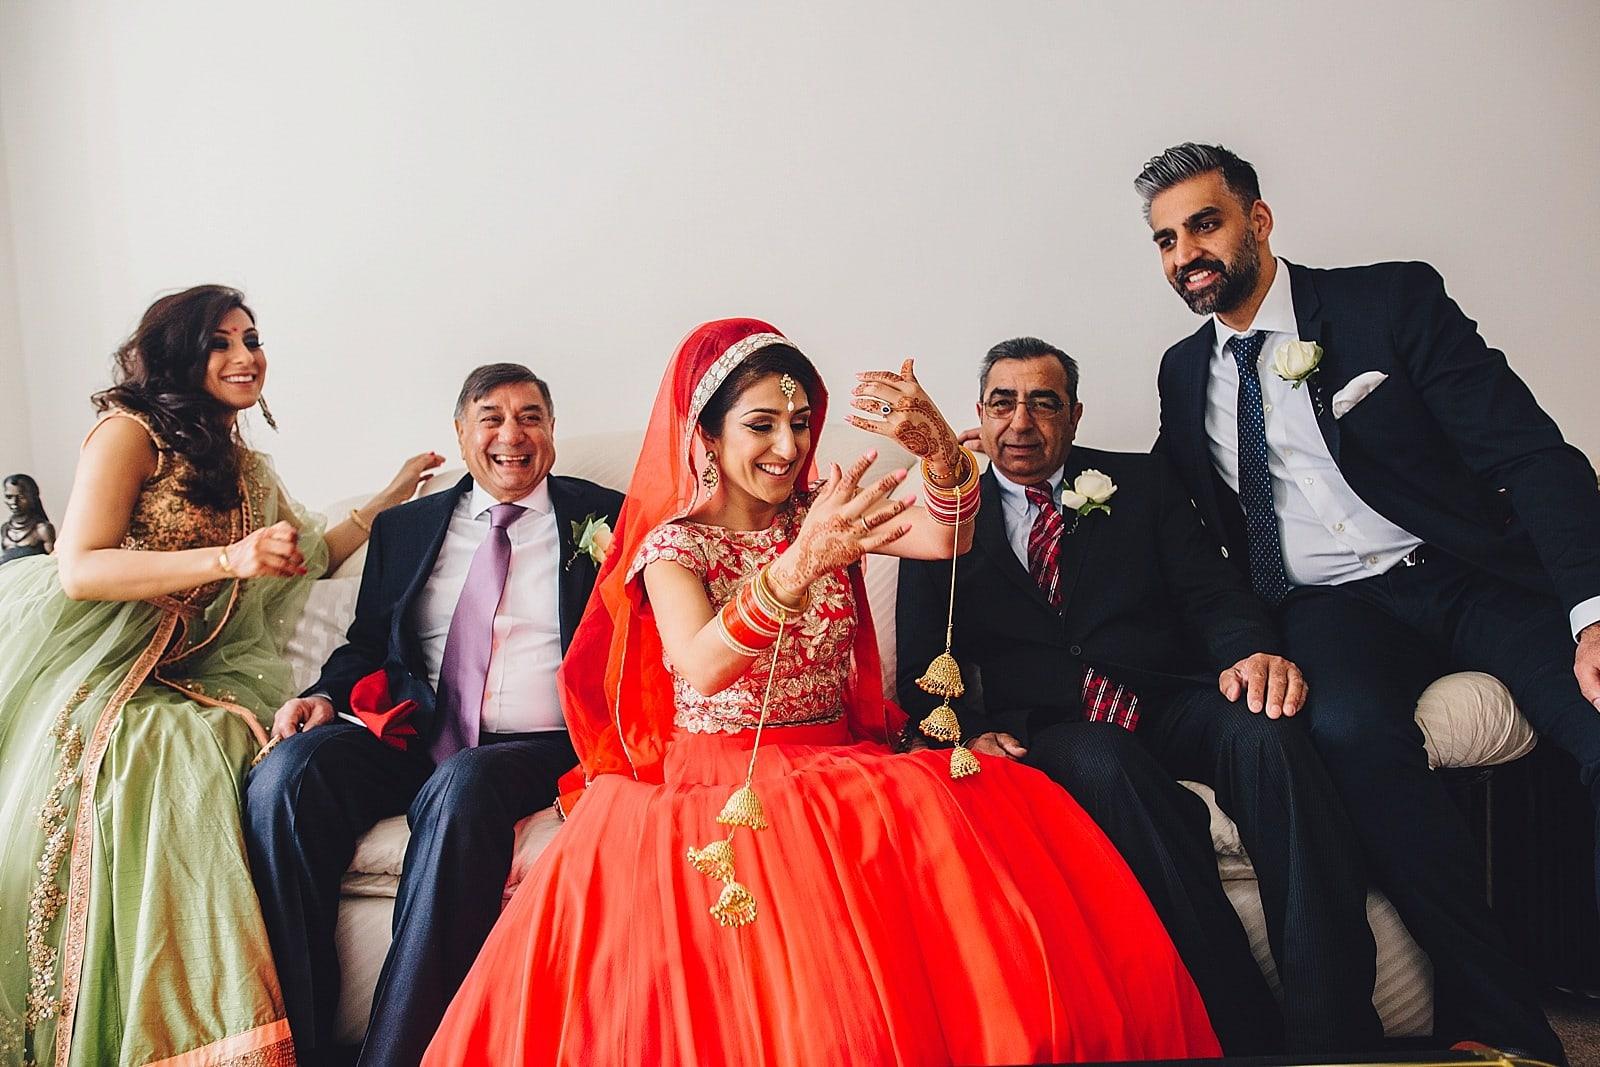 sikh-wedding-photography-birmingham-edgbaston_0108